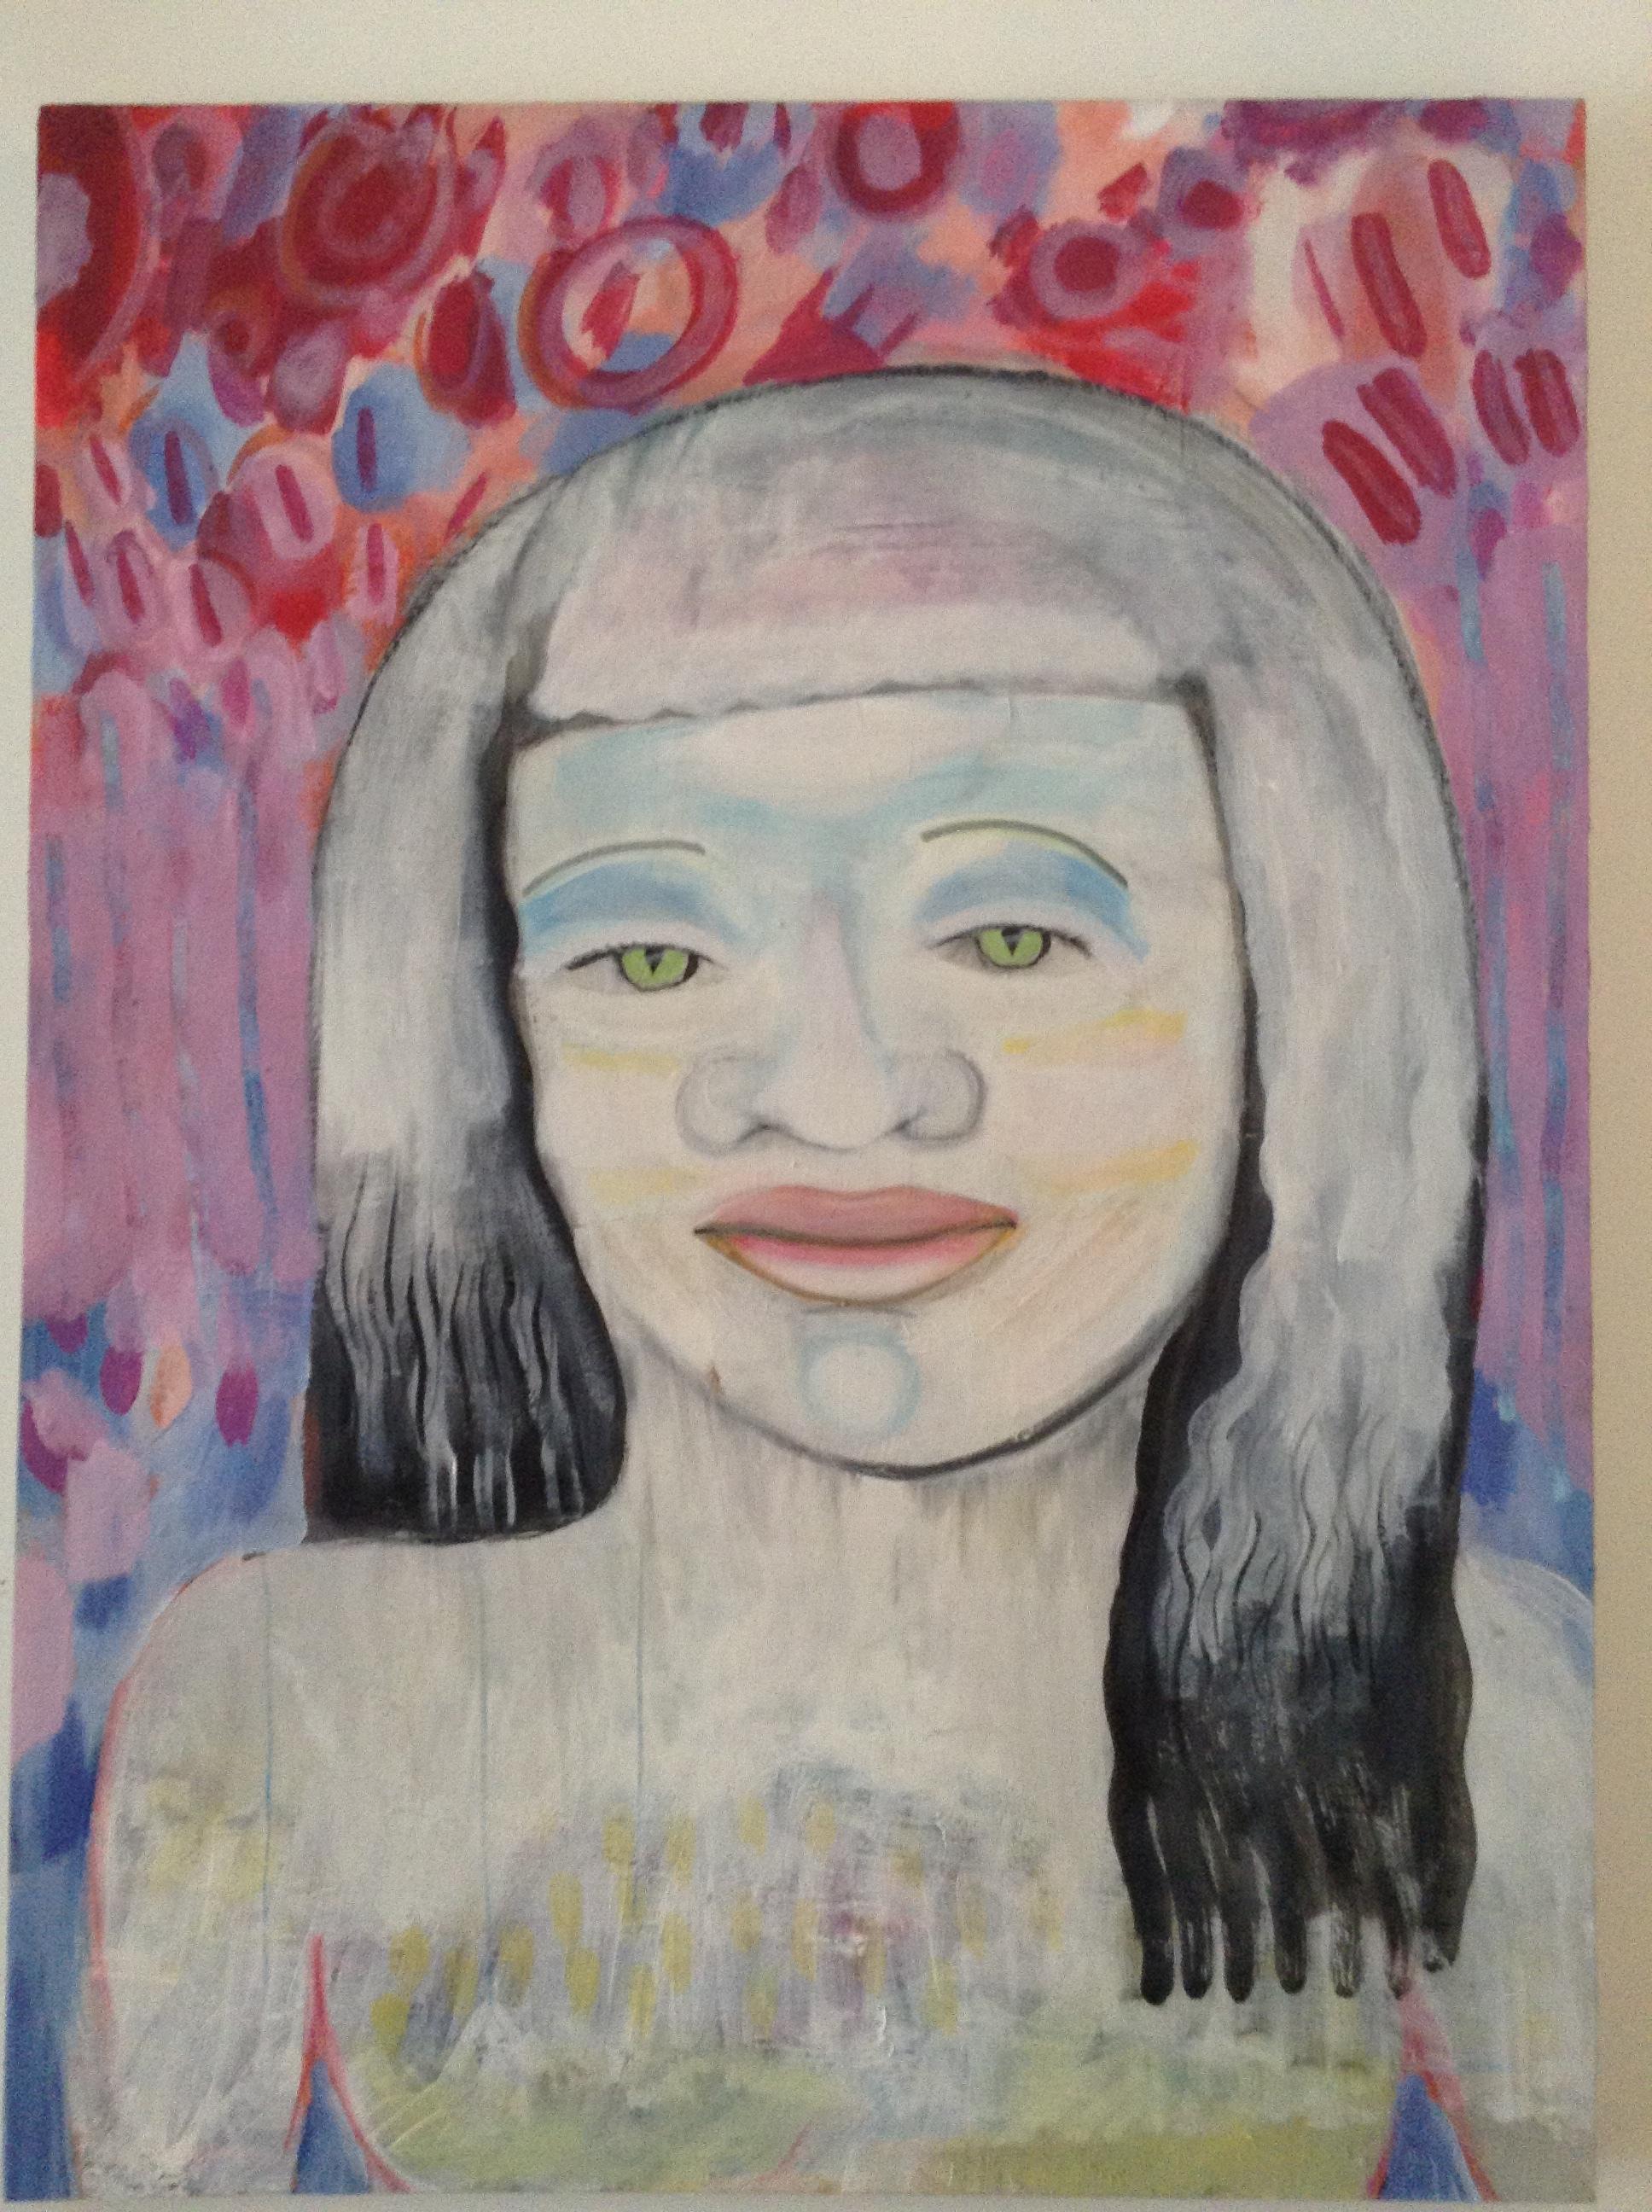 Zara, James Diamond, mixed media on canvas,2017